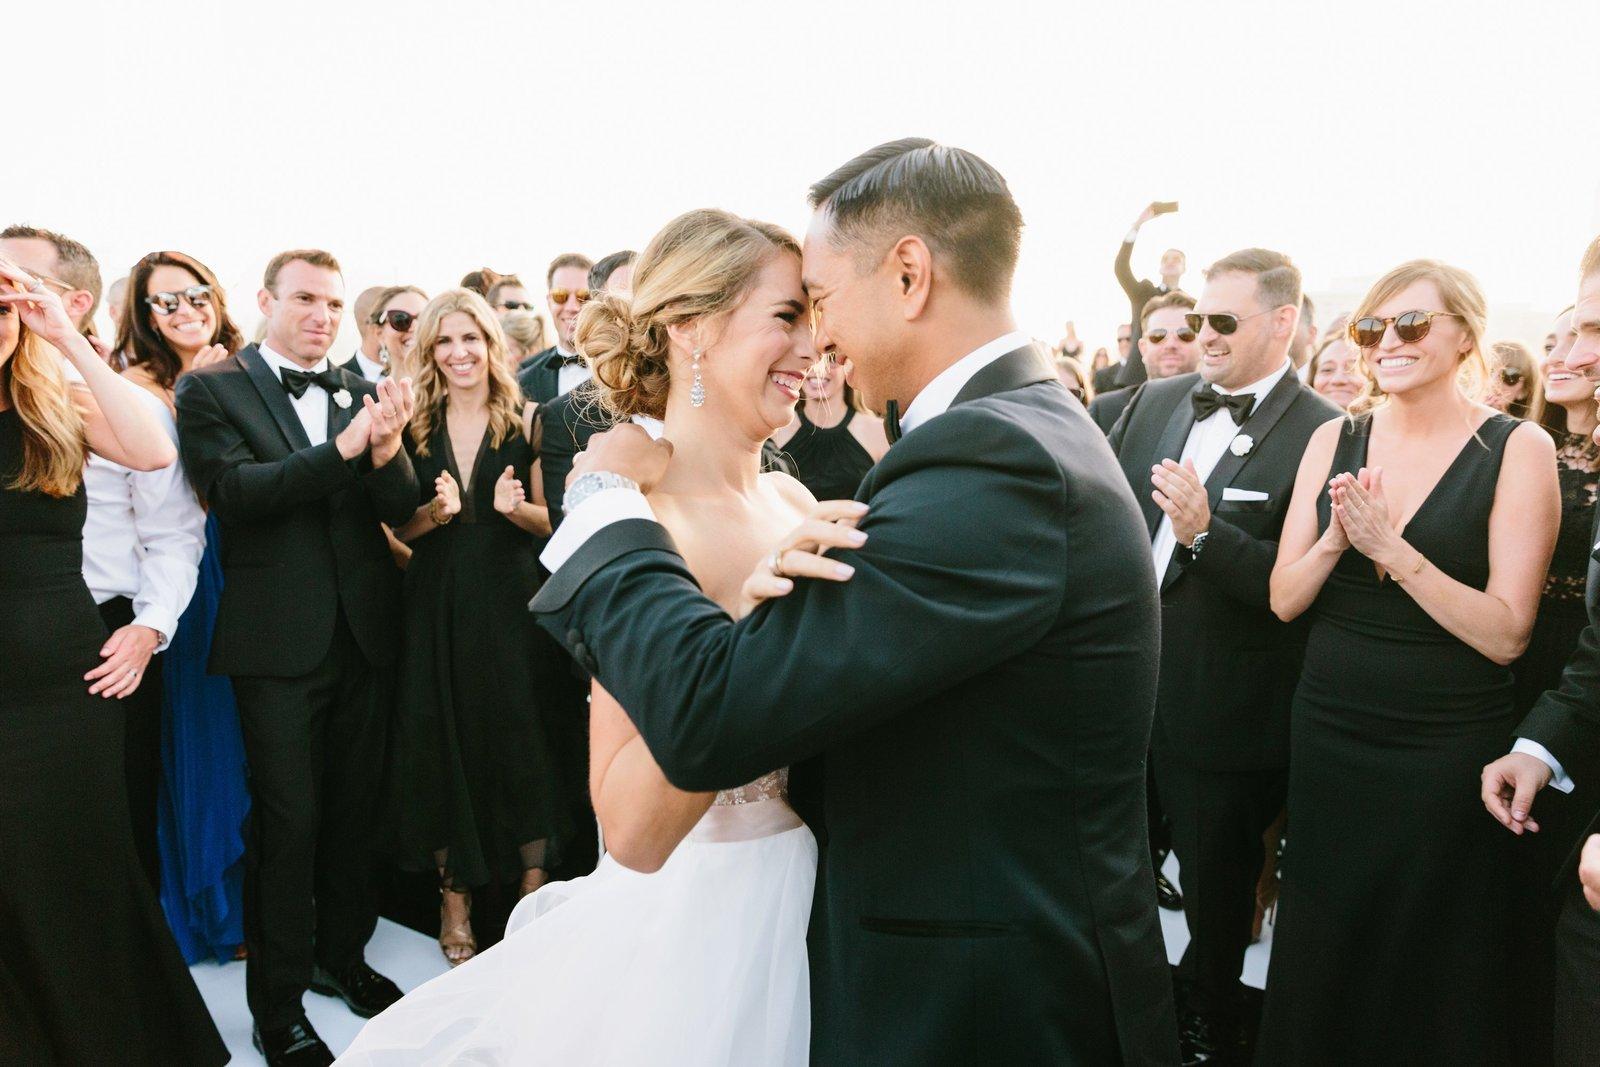 Wedding Photos-Jodee Debes Photography-031